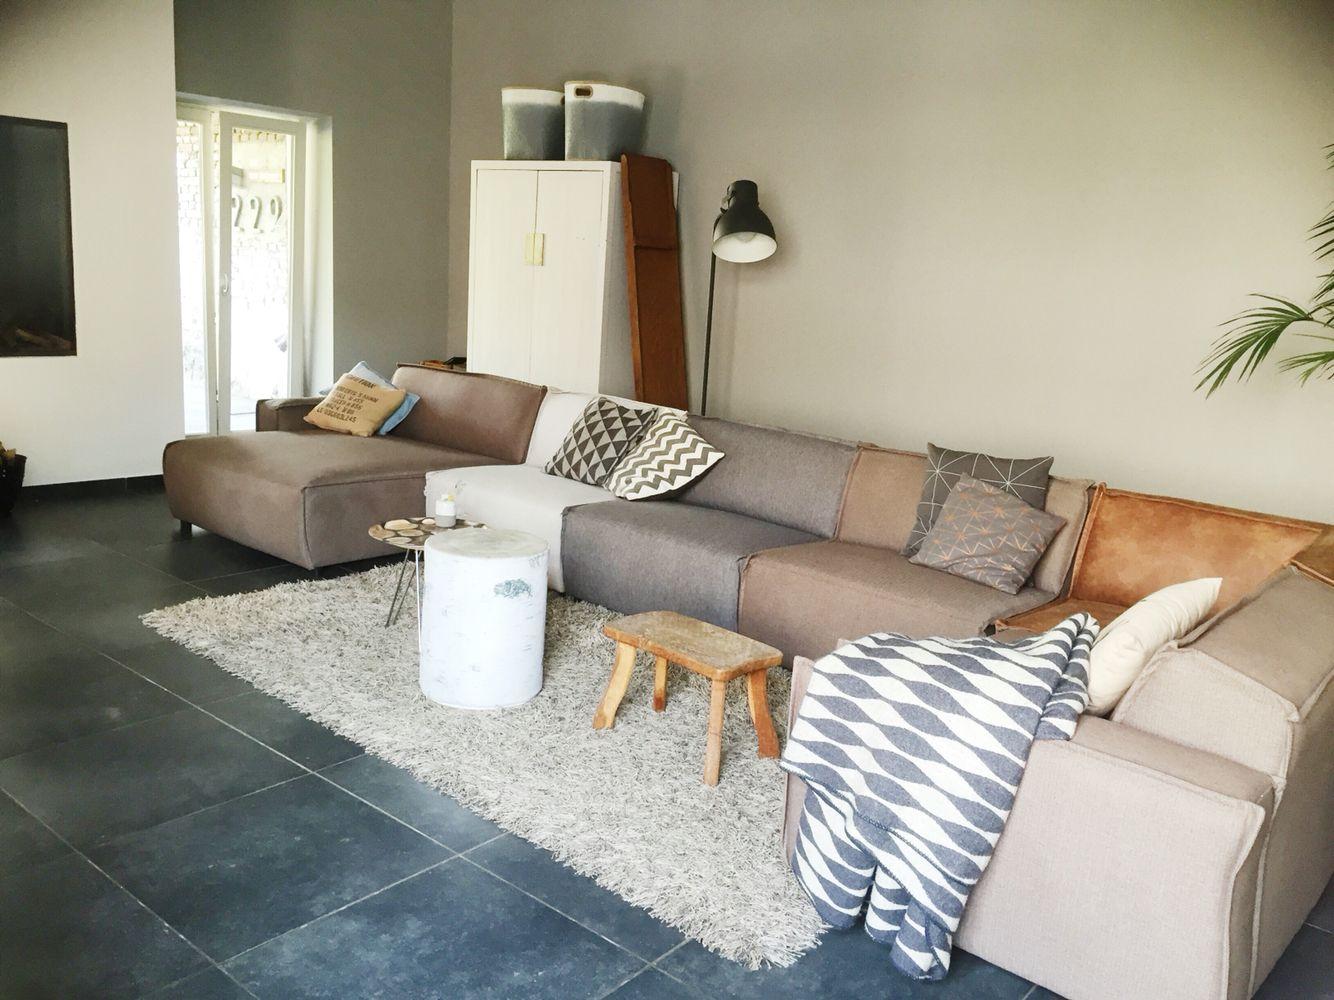 Woonkamer@ Vaes in huis#umix#leenbakker | woonkamer | Pinterest | Banks